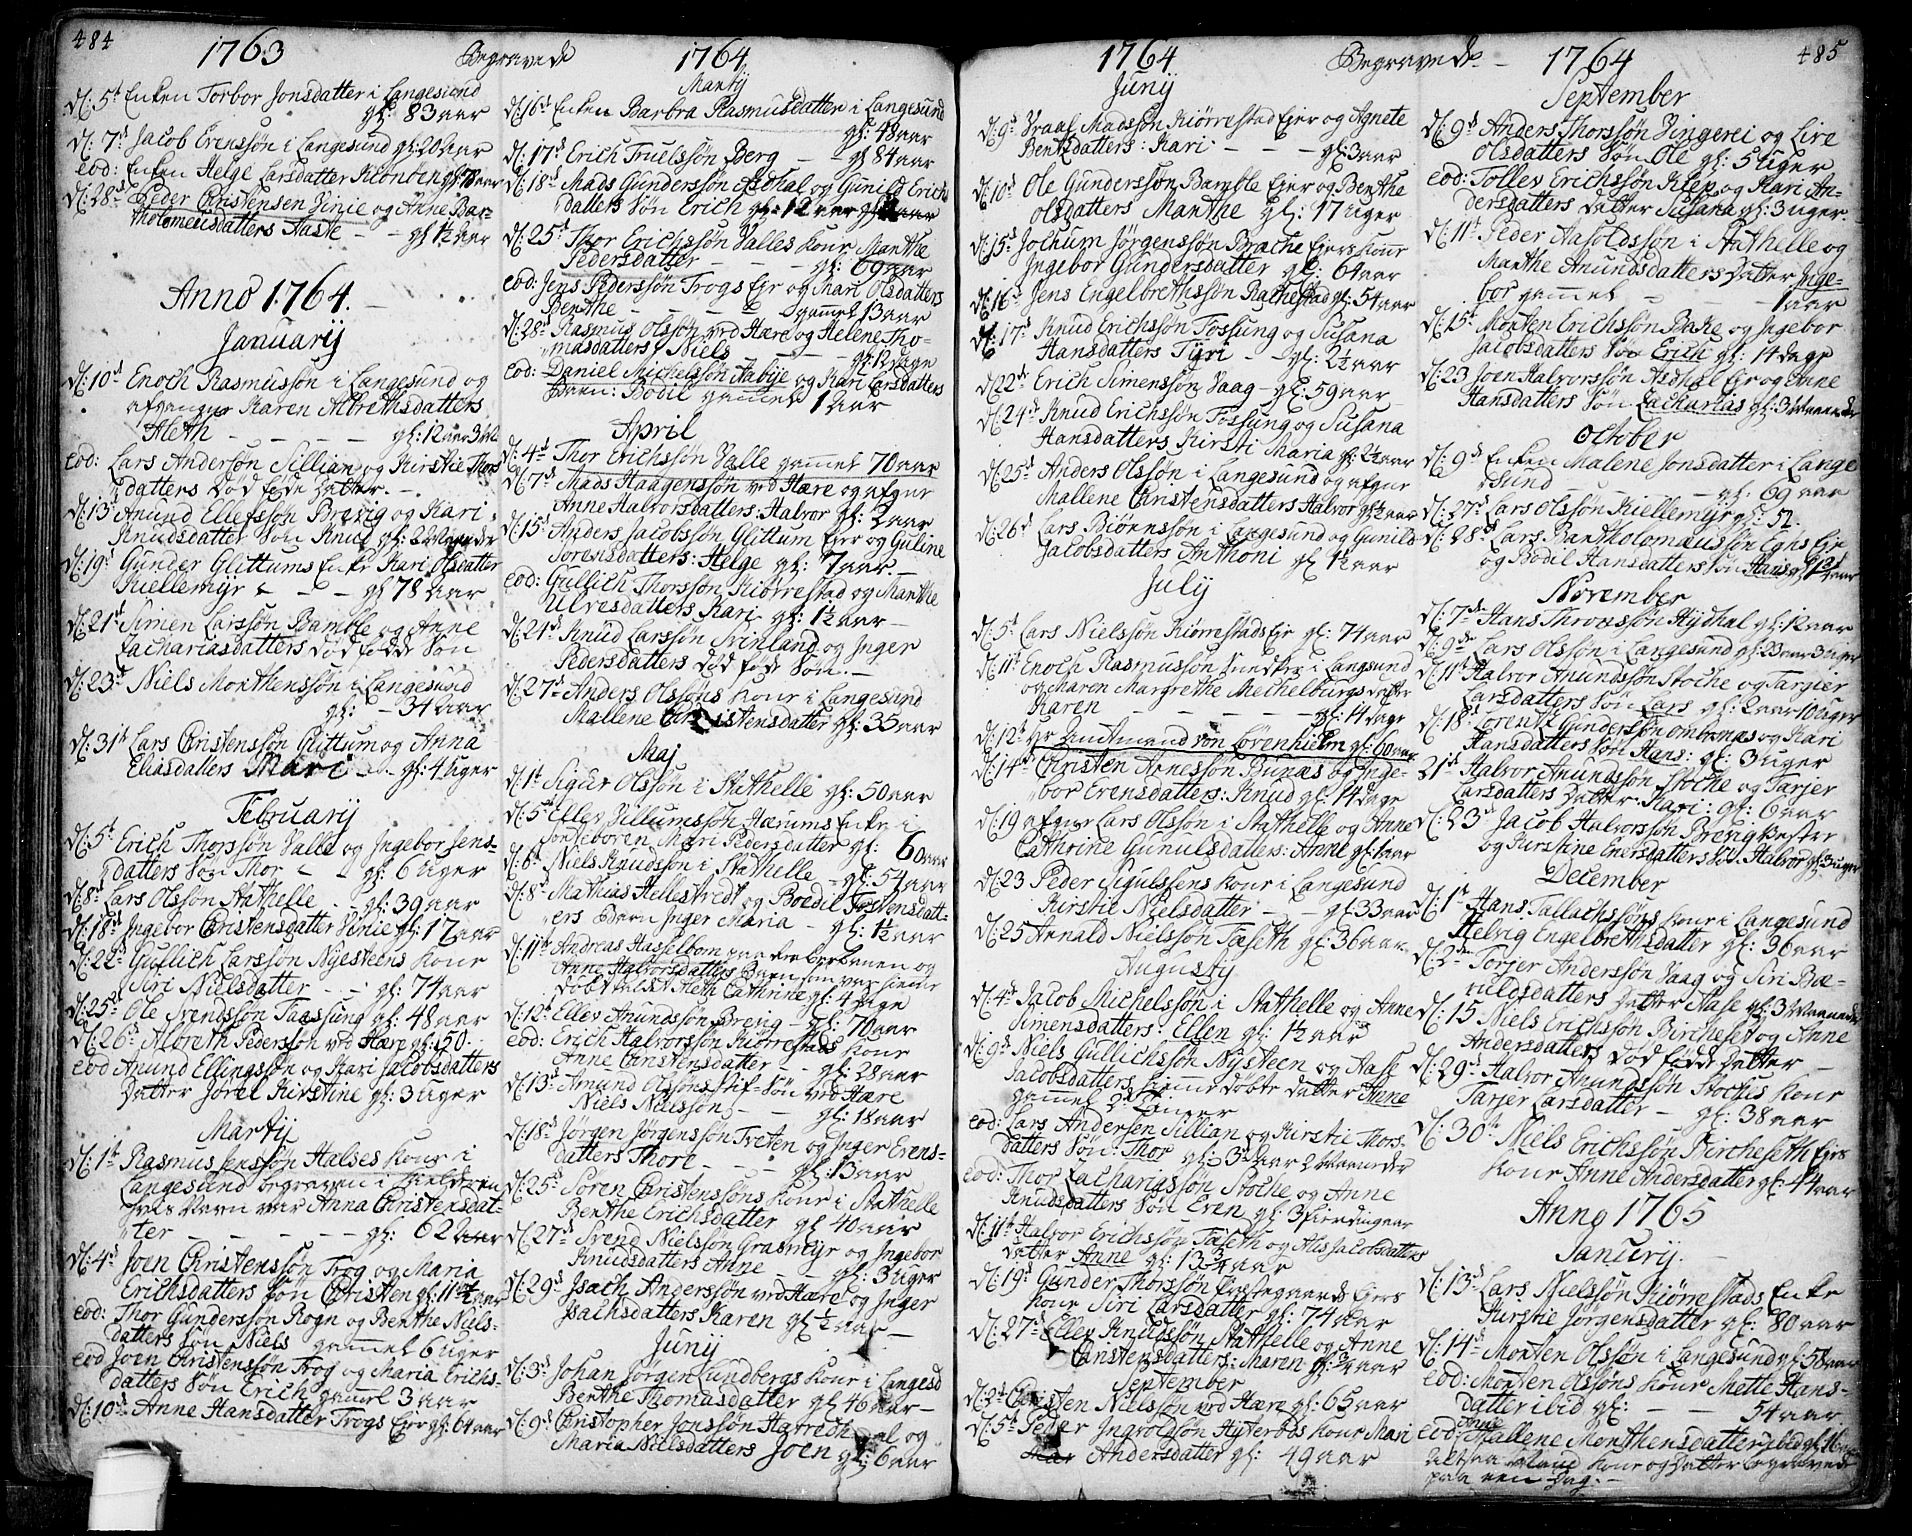 SAKO, Bamble kirkebøker, F/Fa/L0001: Ministerialbok nr. I 1, 1702-1774, s. 484-485